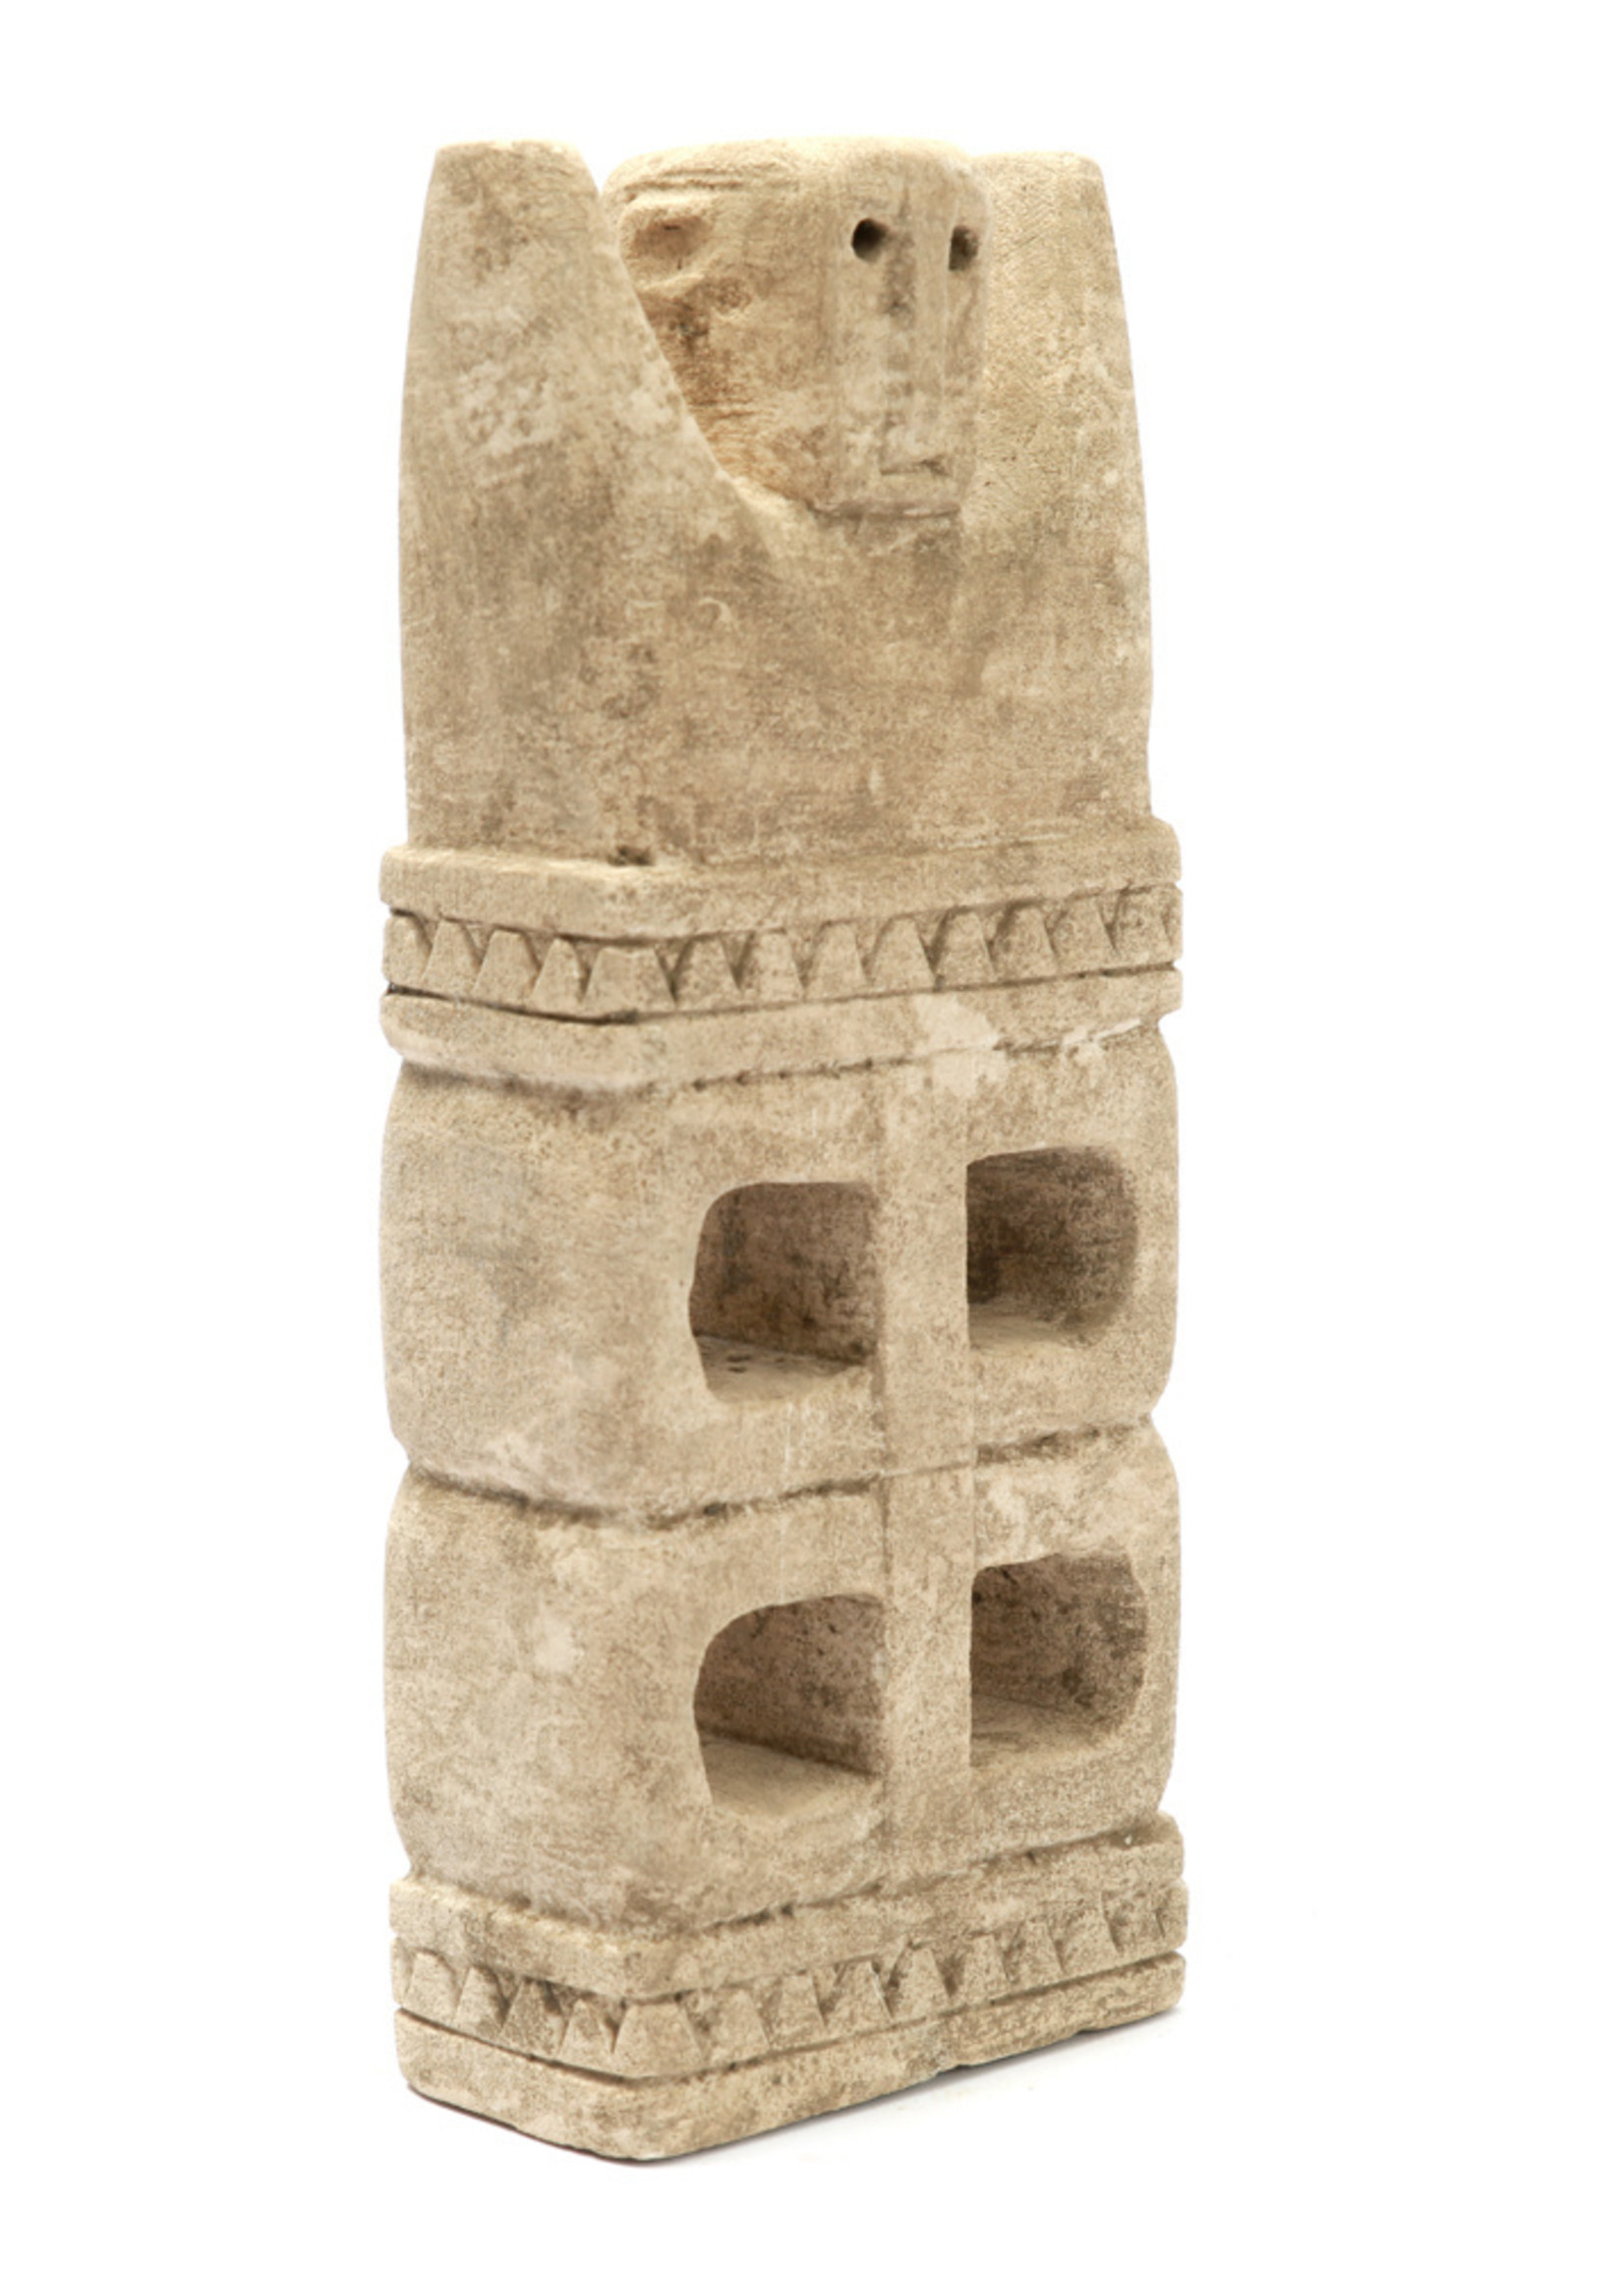 Sumba Stone Statue #01 - Natural